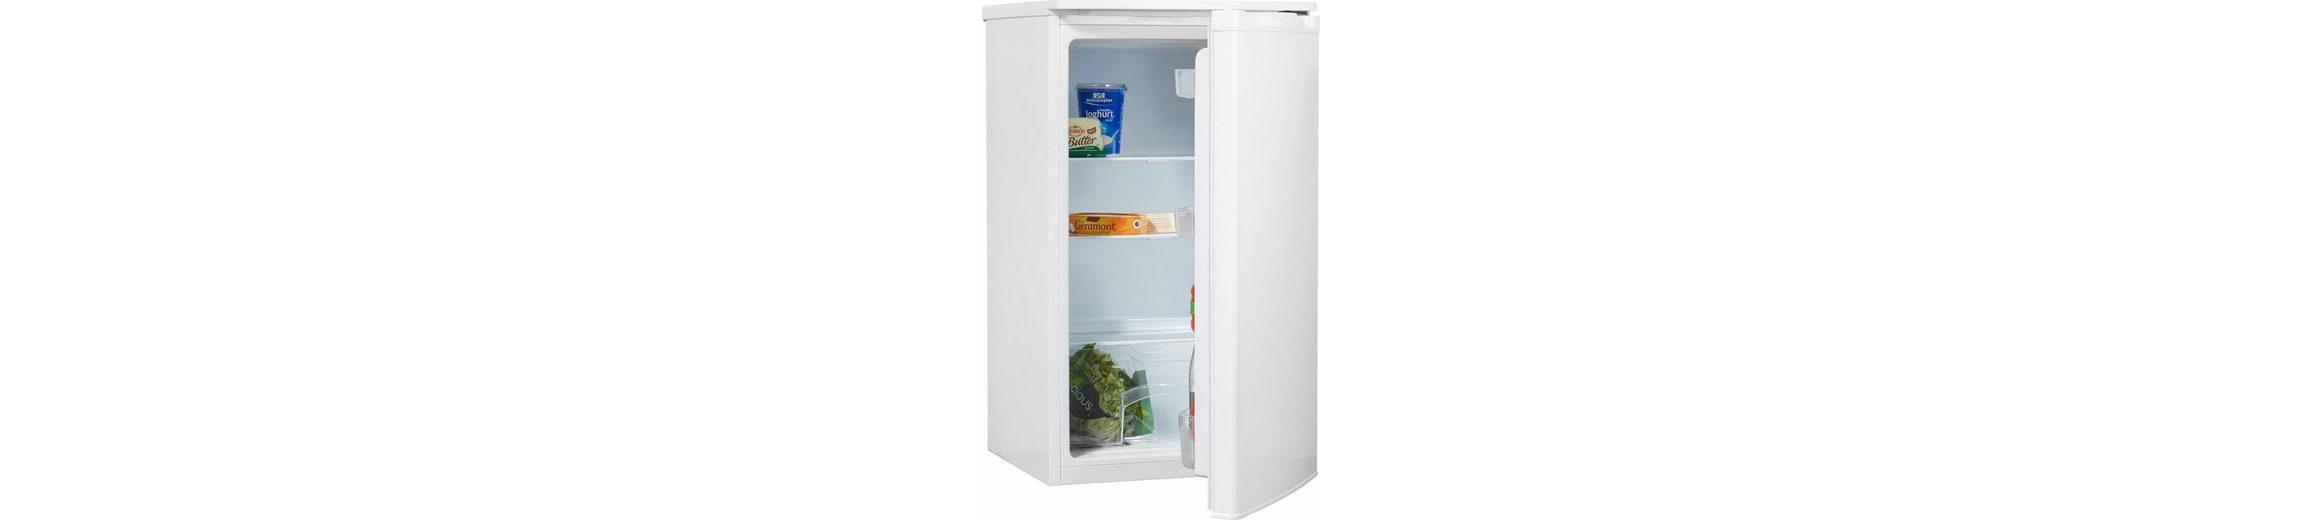 Hanseatic Kühlschrank HKS 8548A1, Energieklasse A+, 84,2 cm hoch